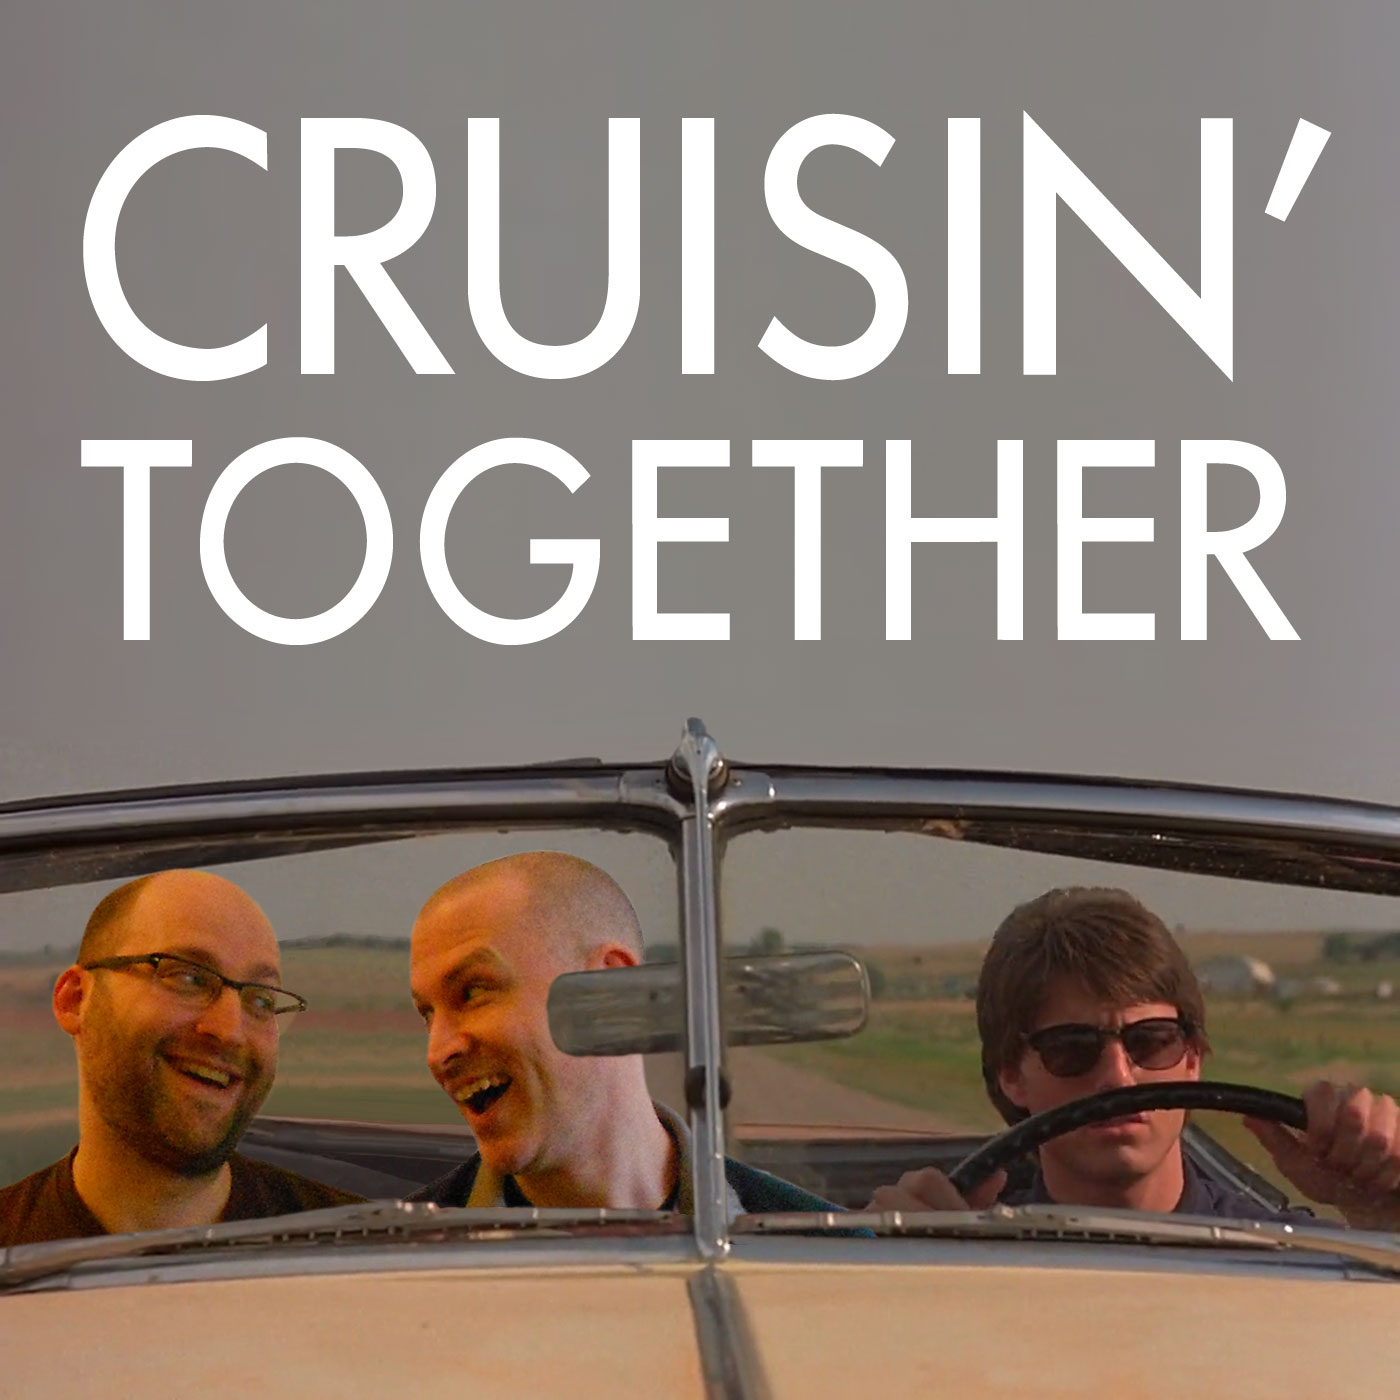 Cruisin' Together